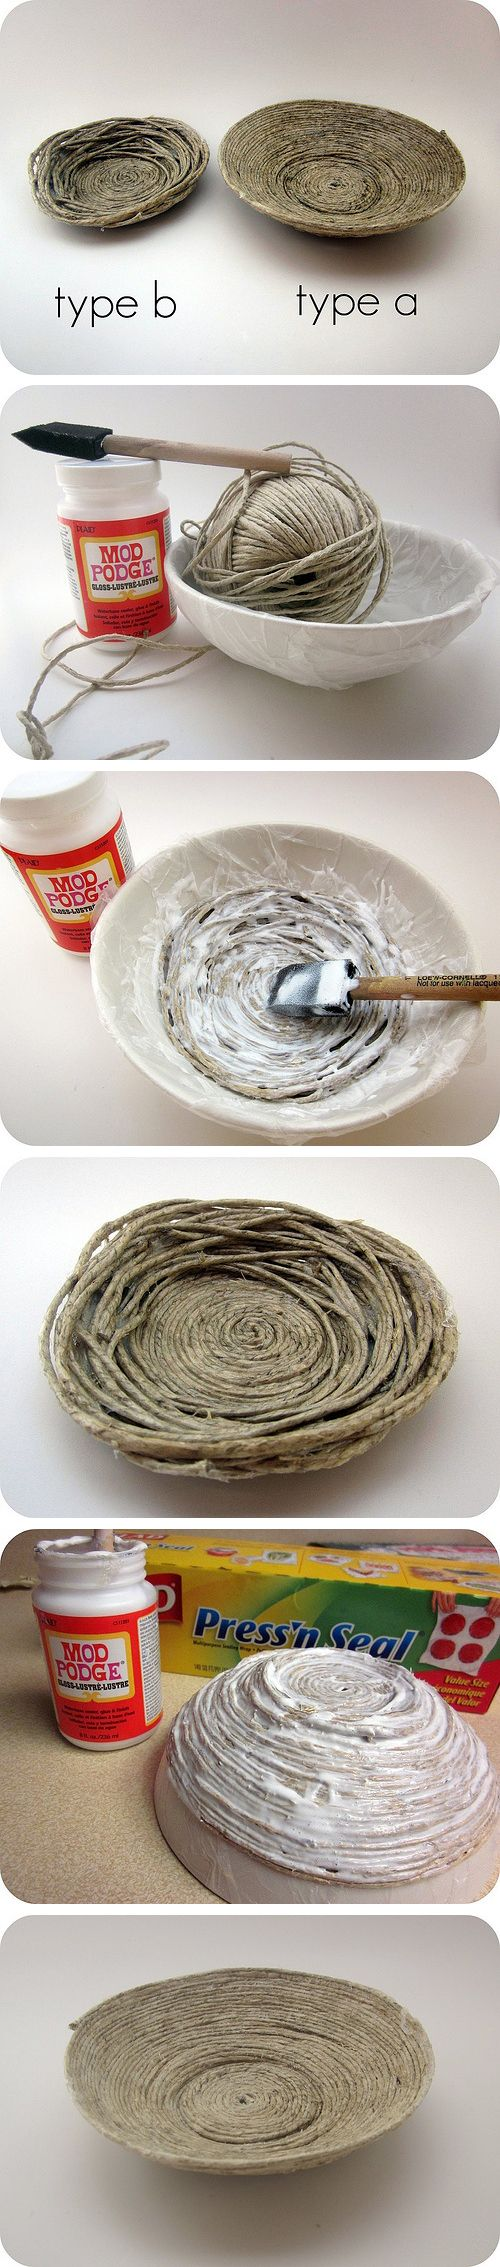 bowl: Diy Bowls, Projects, Yarns Bowls, Crafts Ideas, Diy'S, Birds Nests, Mod Podge, String Bowls, Ropes